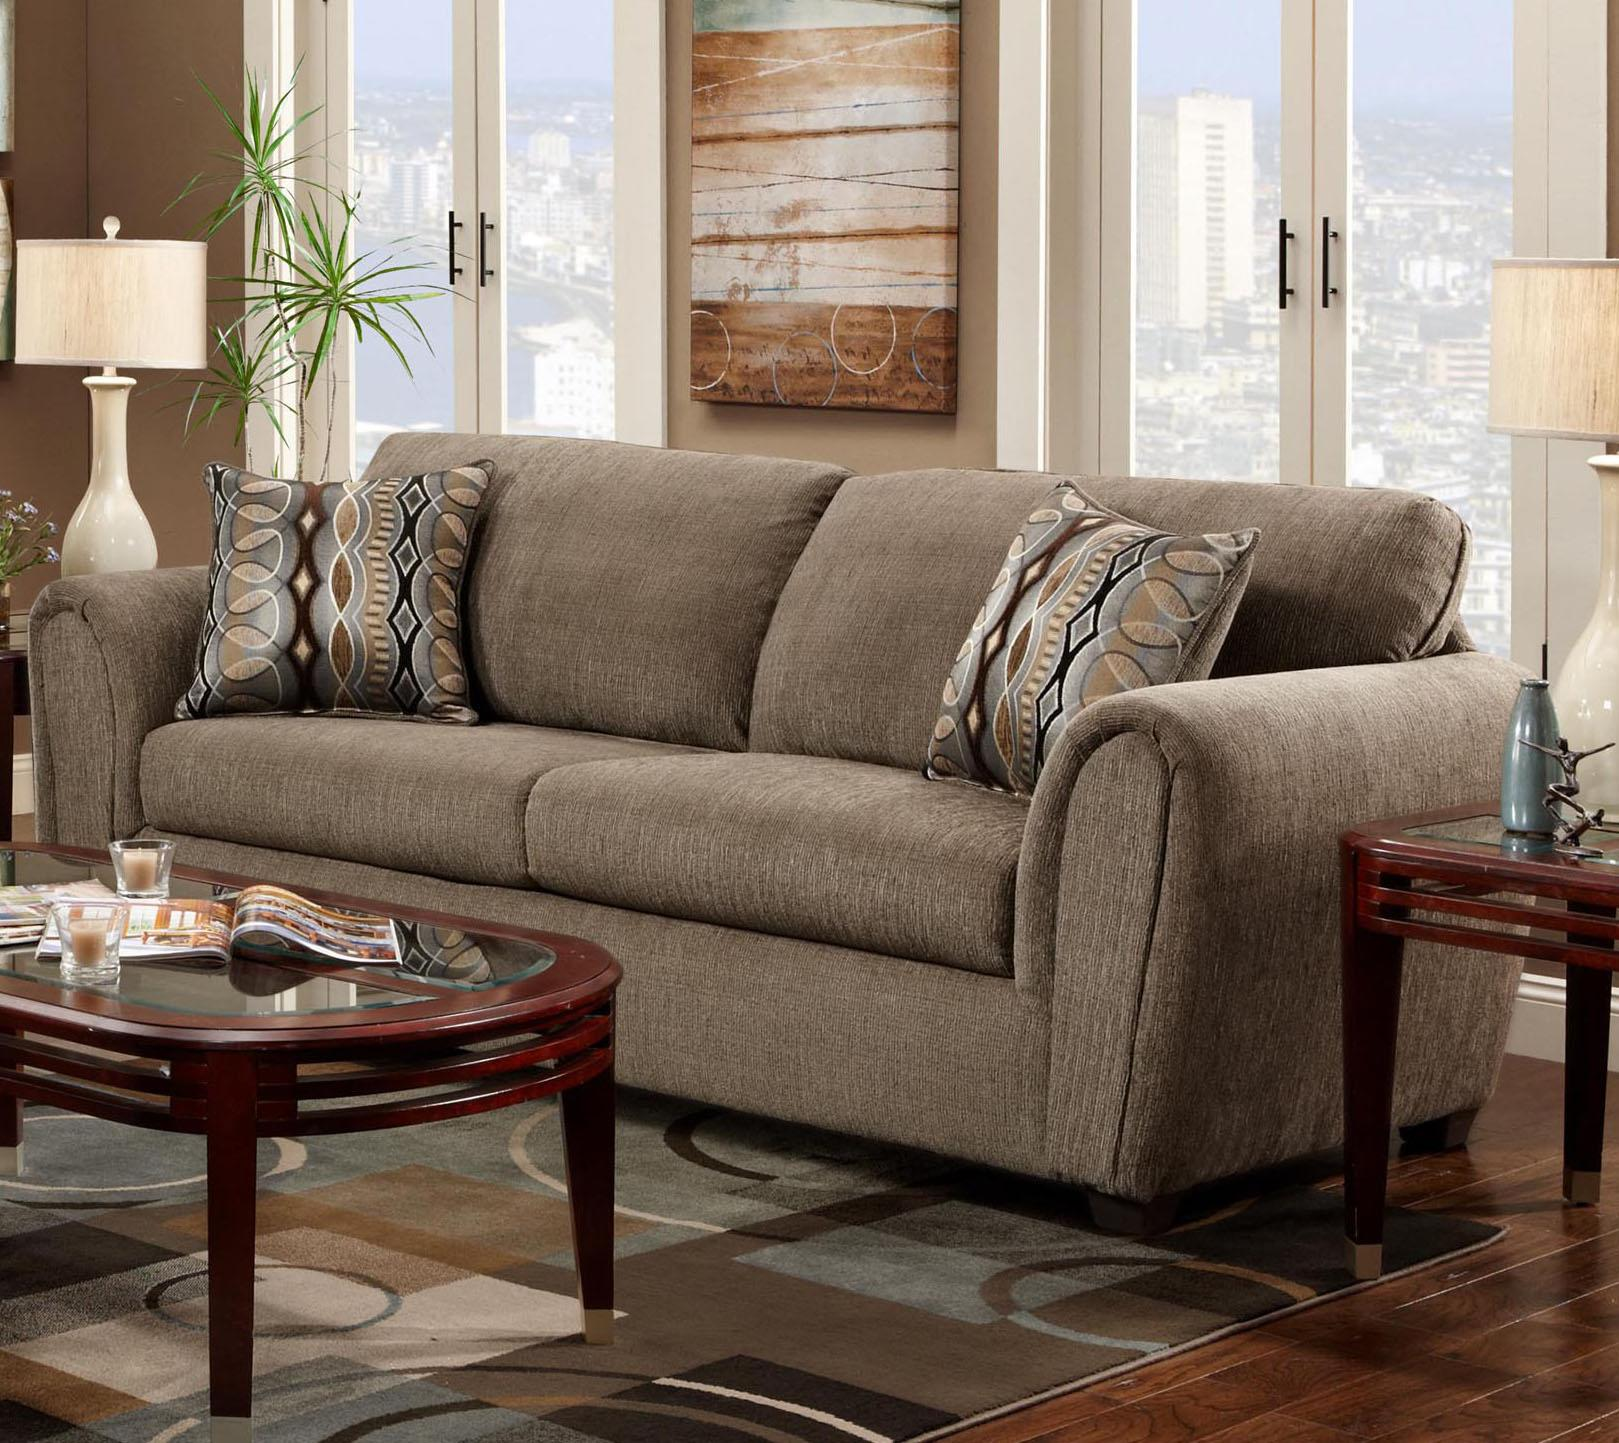 1820 Sofa by Washington Furniture at Lynn's Furniture & Mattress